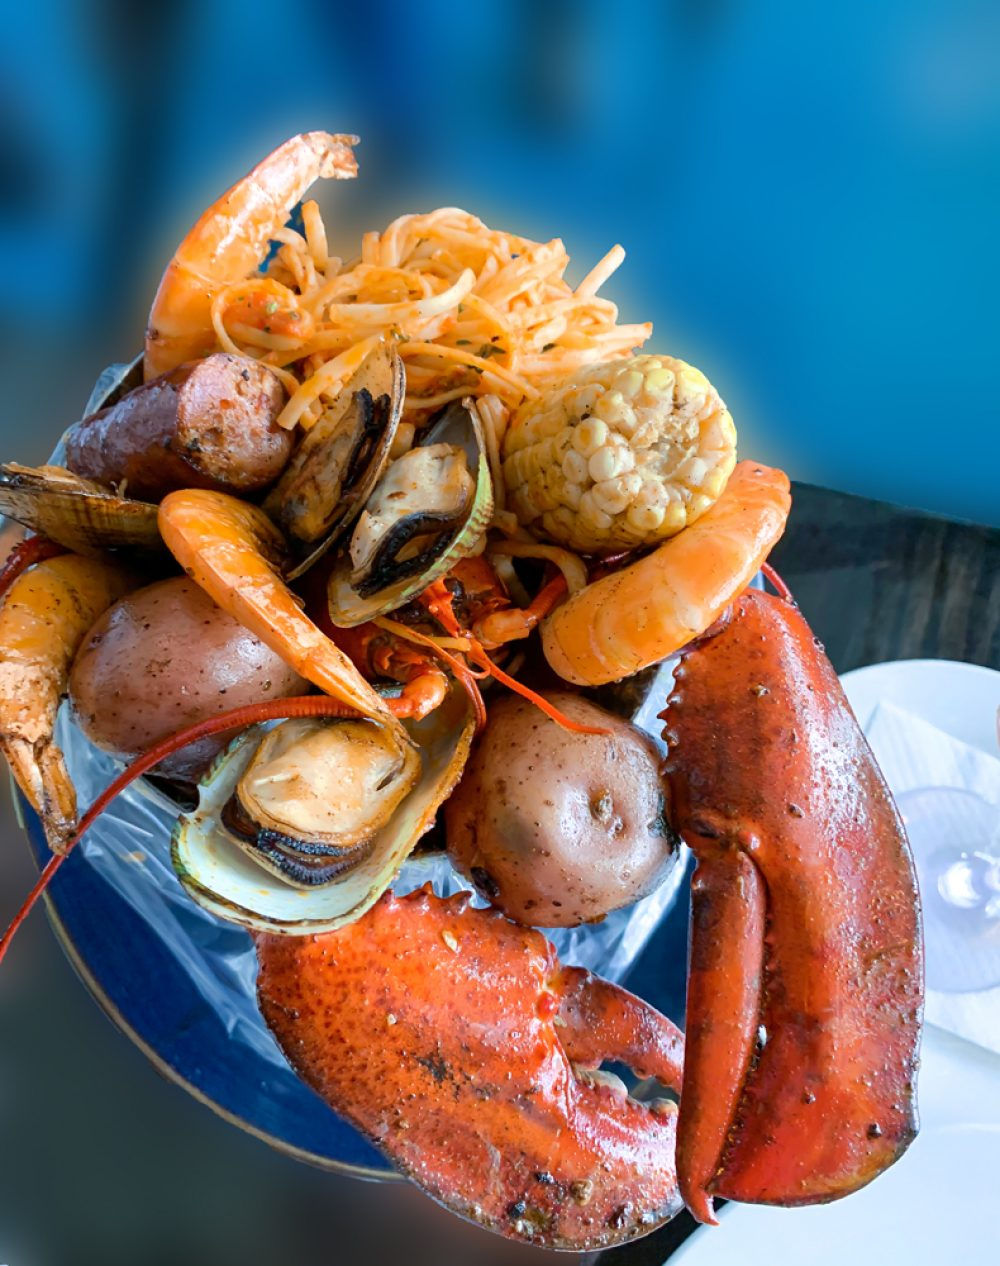 Seadfood Boil